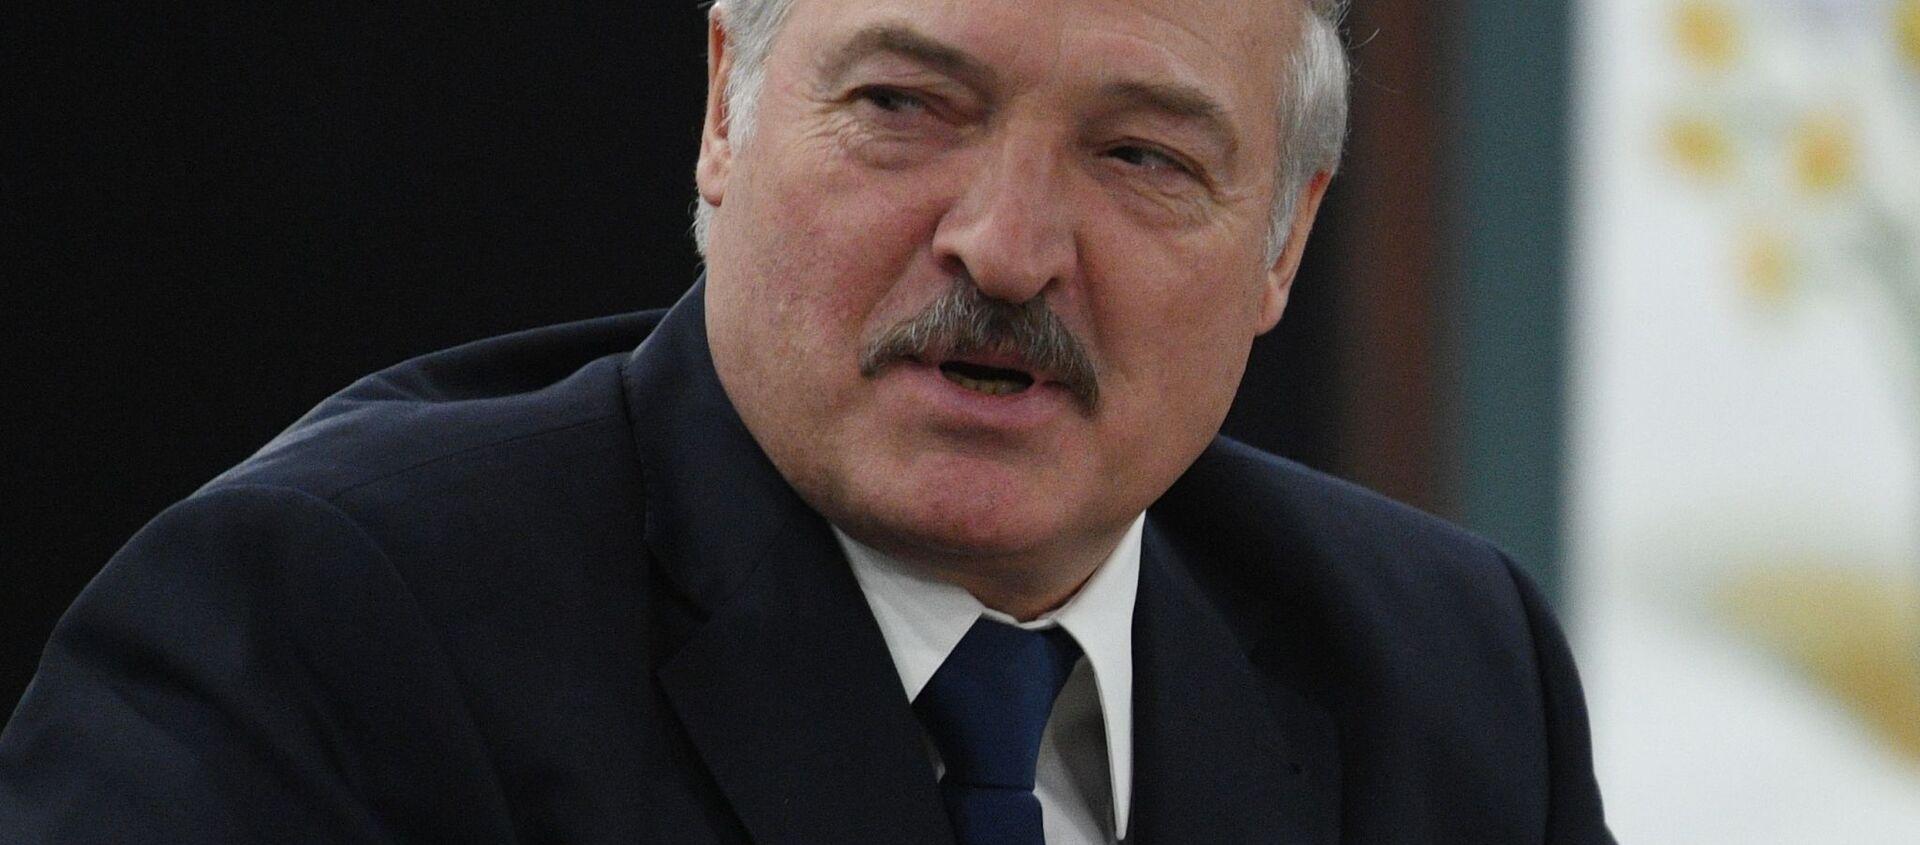 Президент Белоруссии Александр Лукашенко - Sputnik 日本, 1920, 18.04.2021